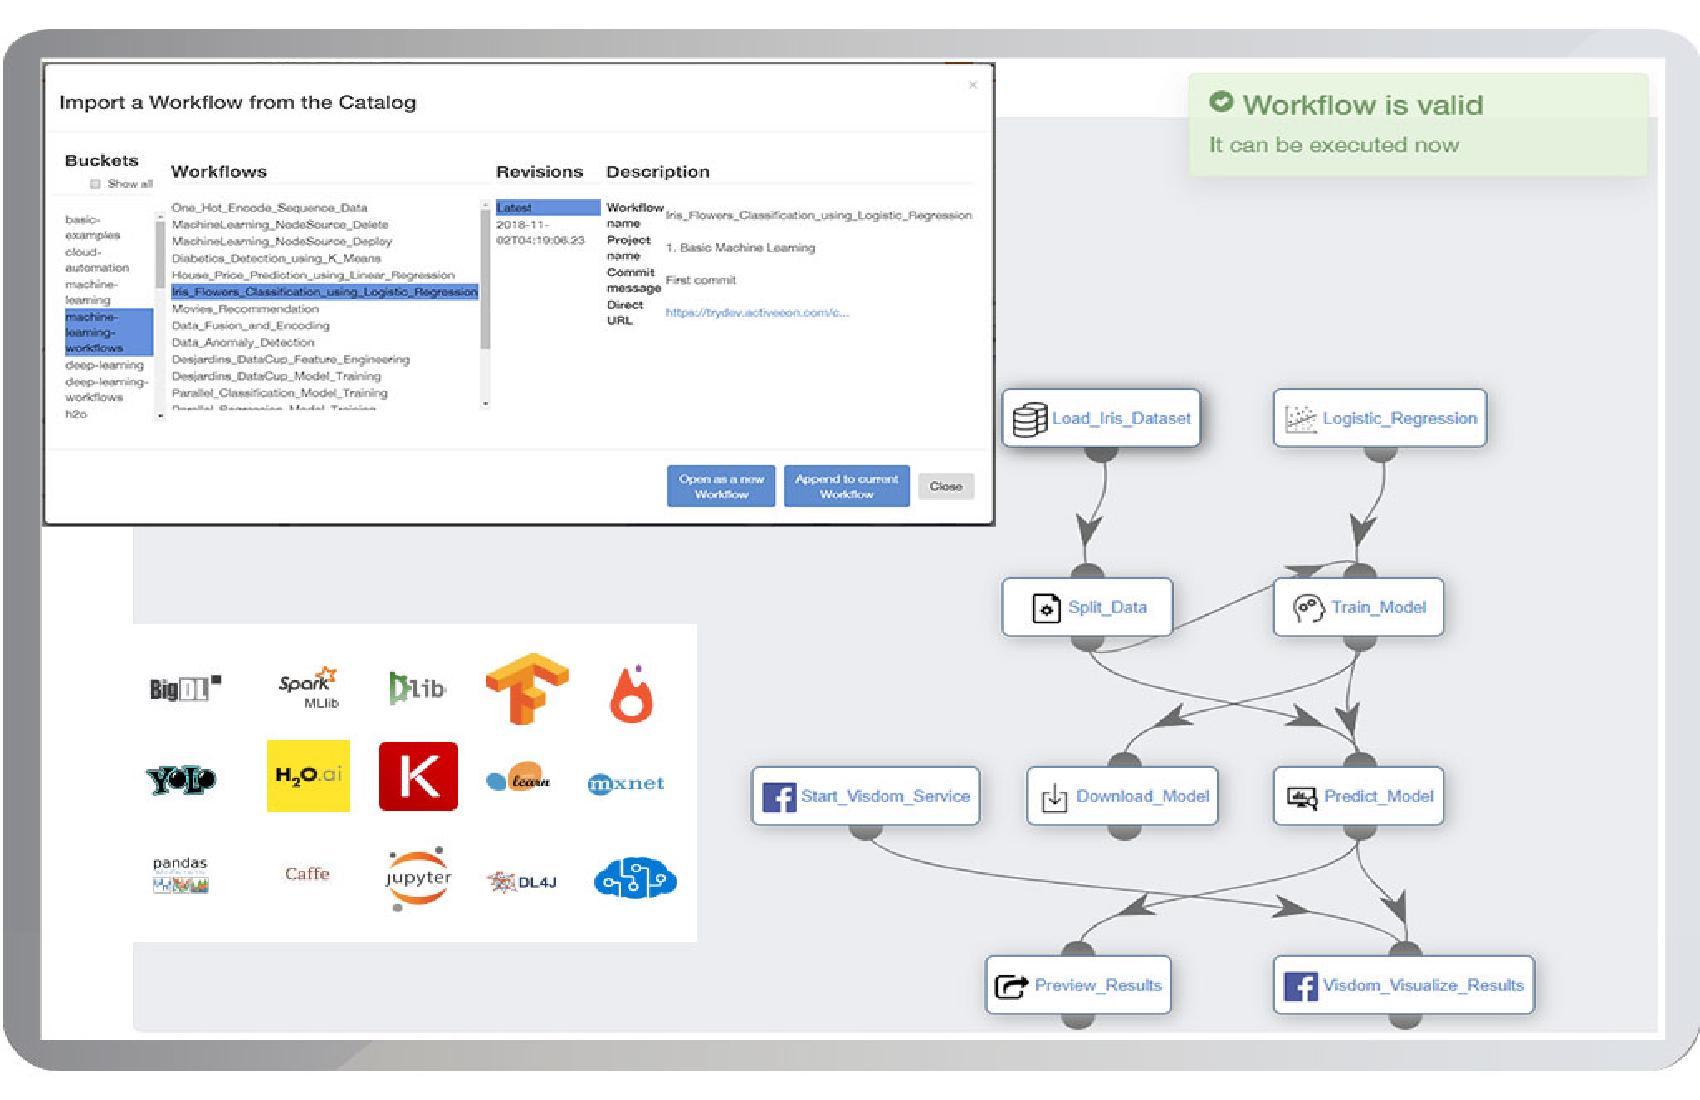 images/product-screenshots/proactive-machine-learning-open-studio-frame.jpg